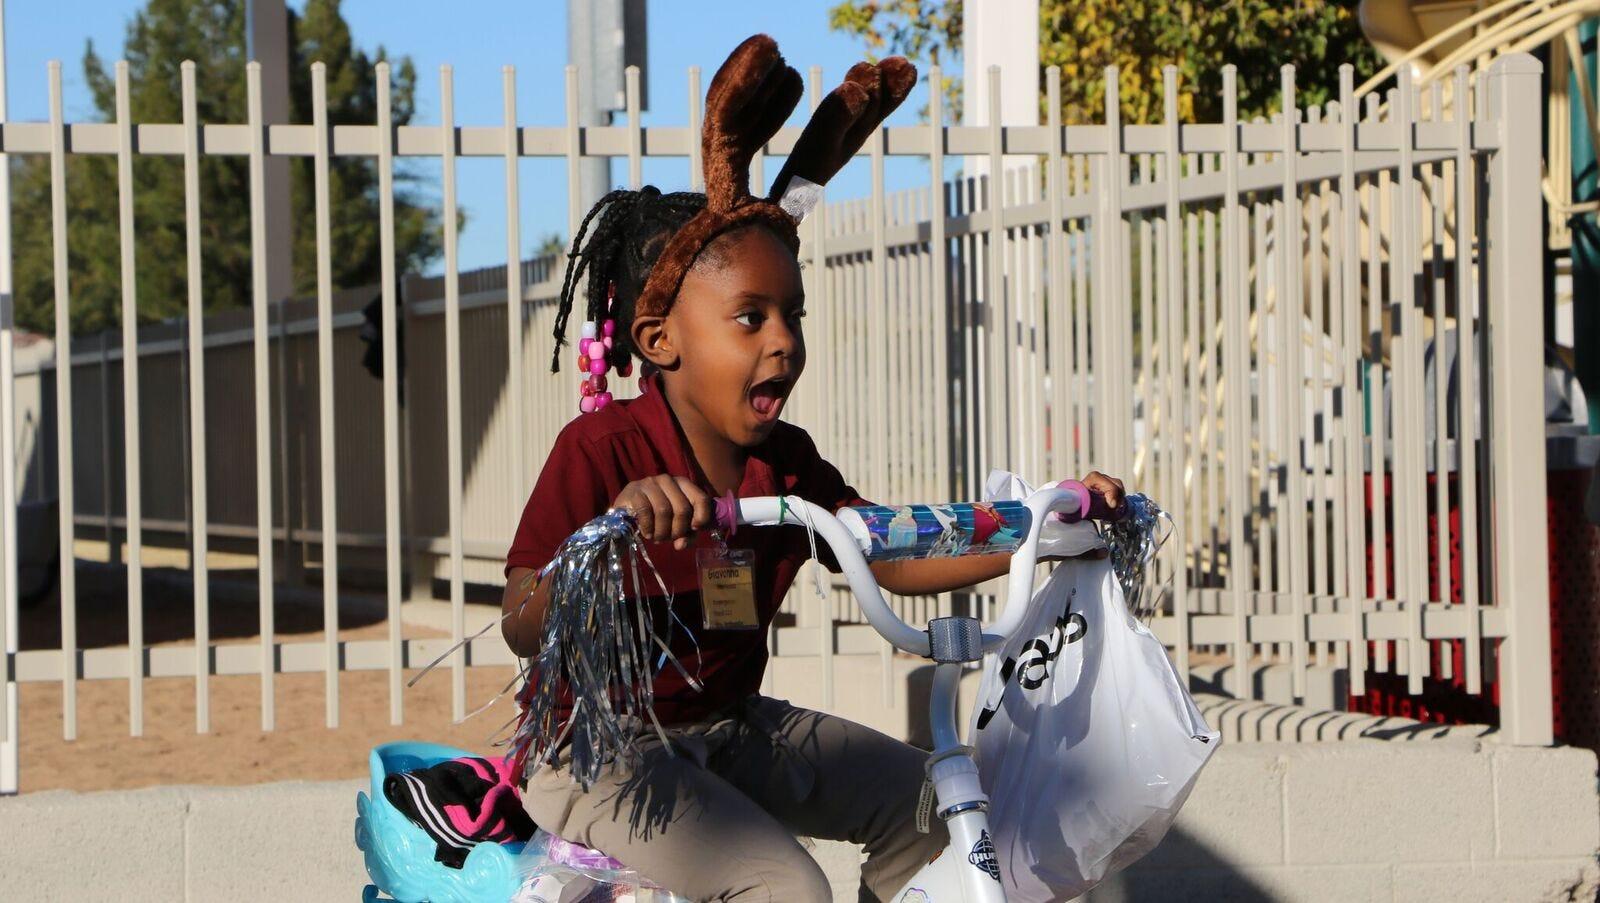 72 Phoenix schoolchildren go bananas when new bikes are revealed